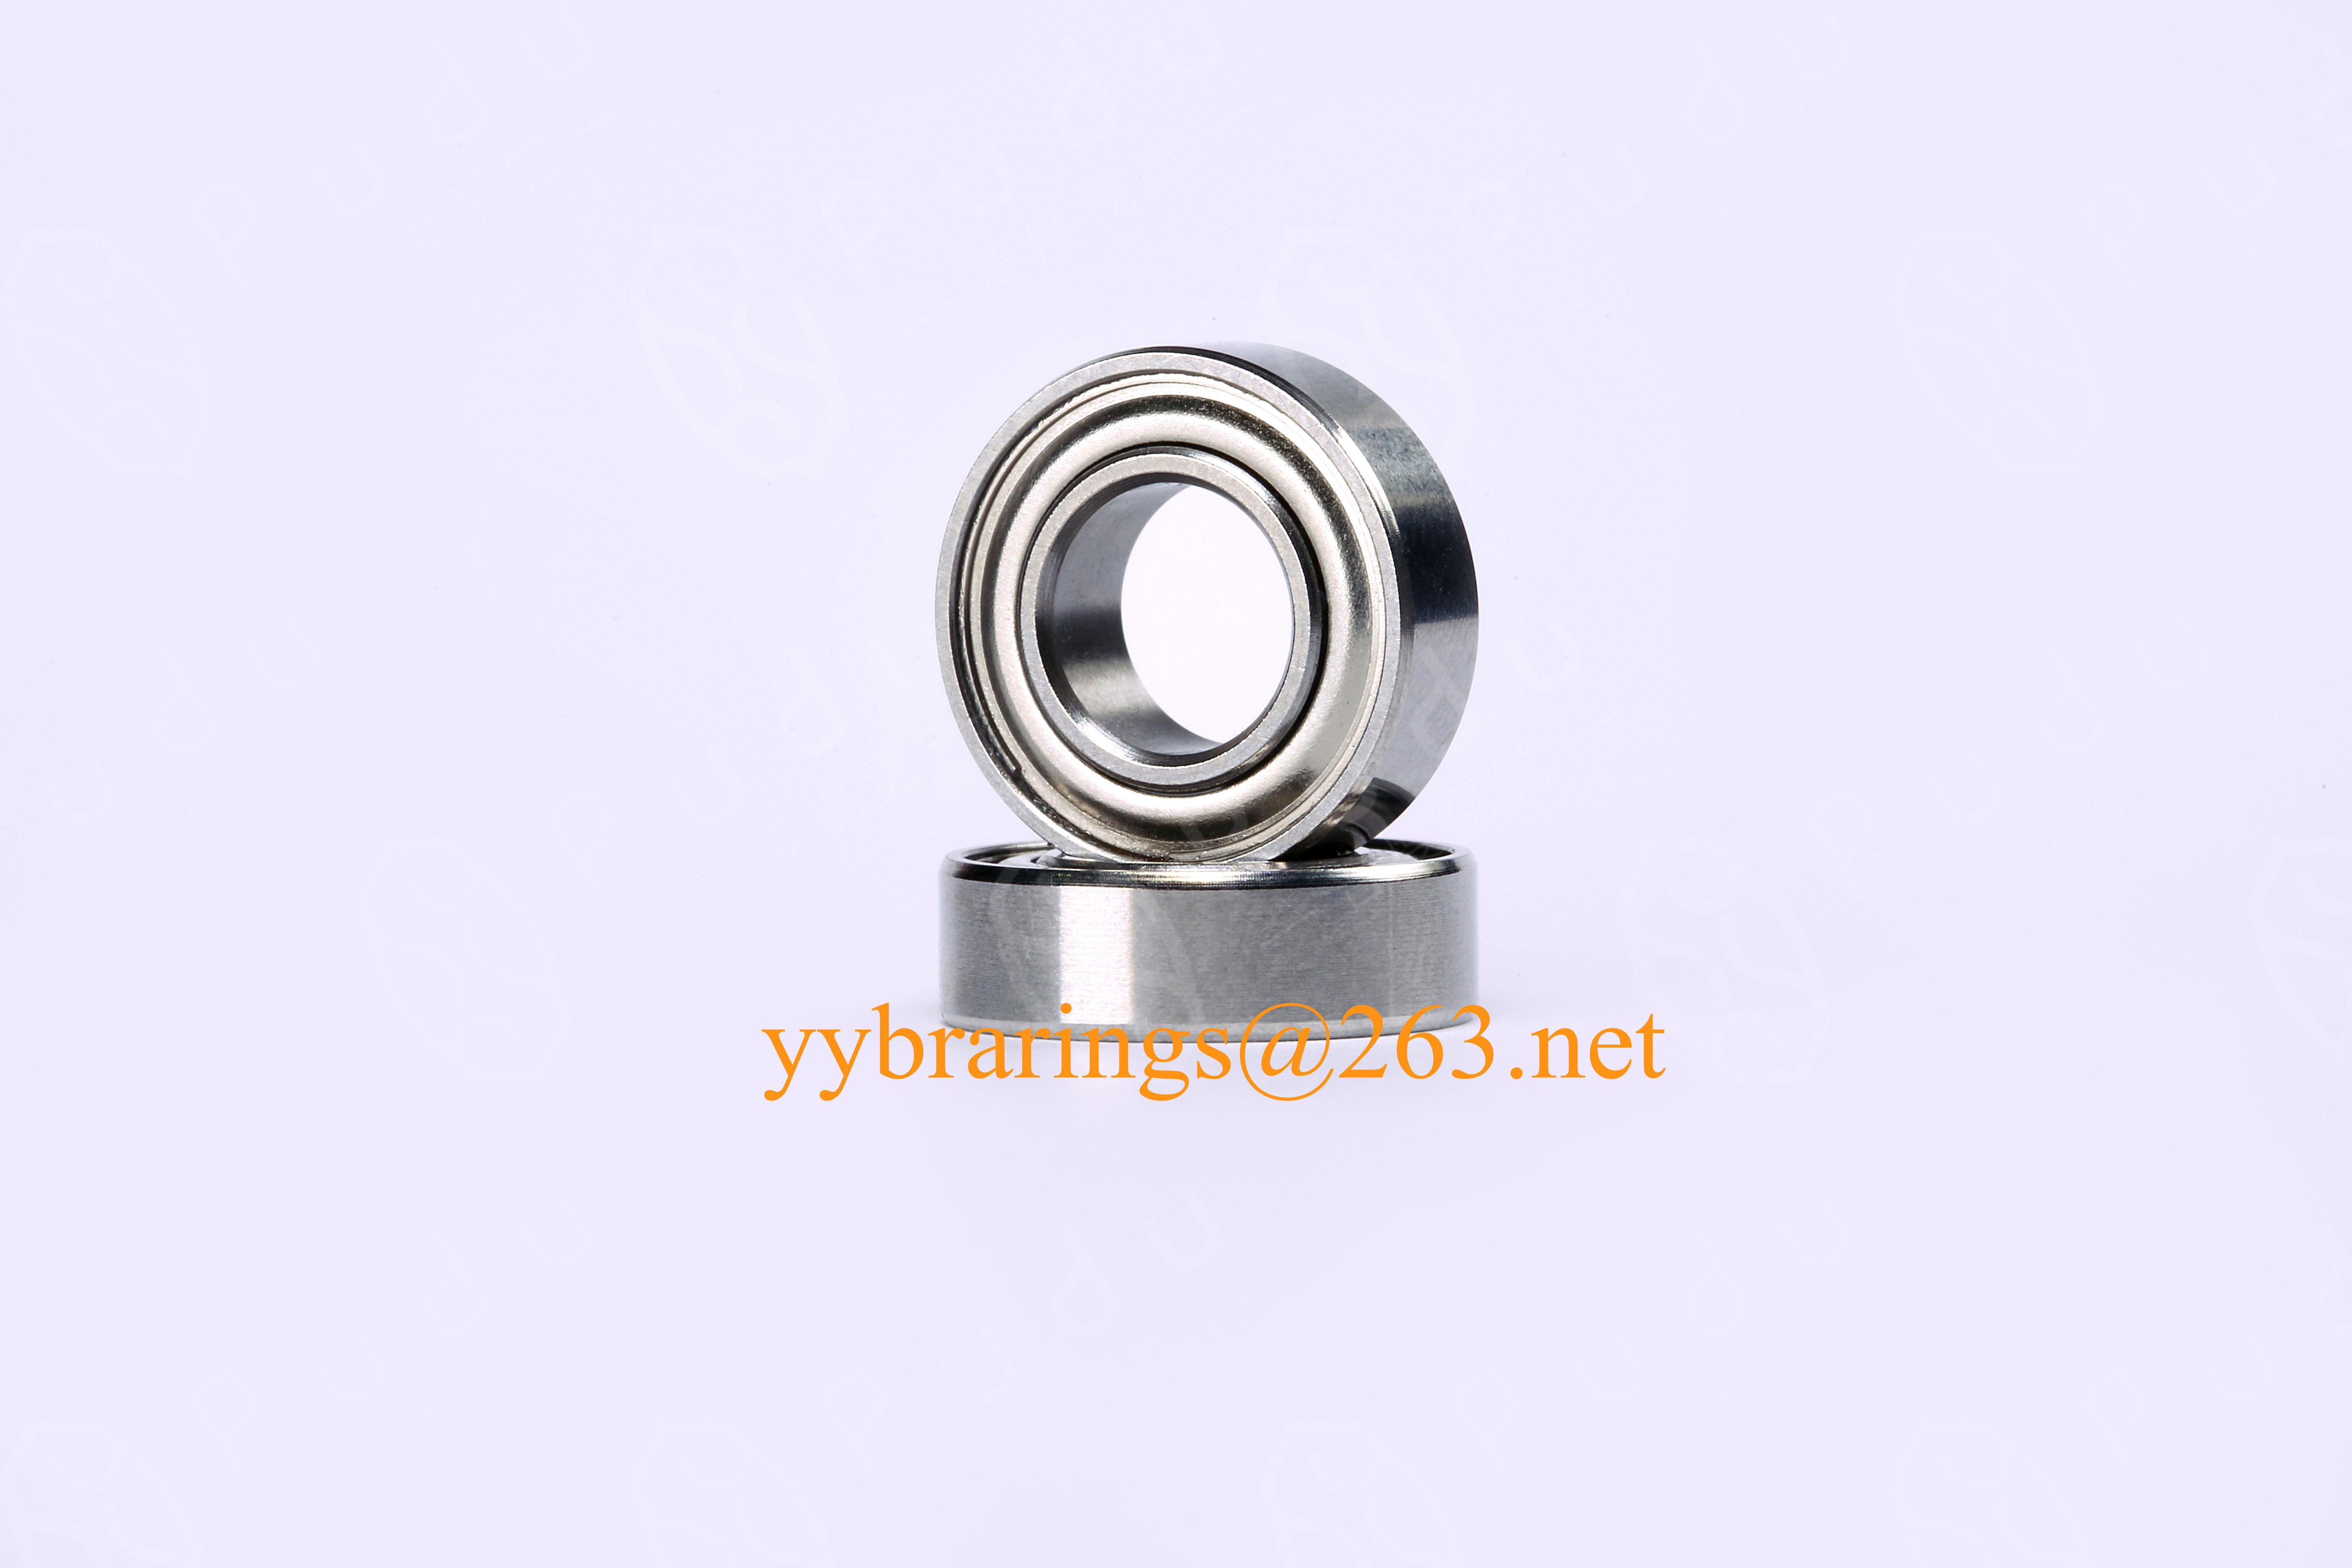 R188ZZ 6.35X12.7X4.762MM Bearing